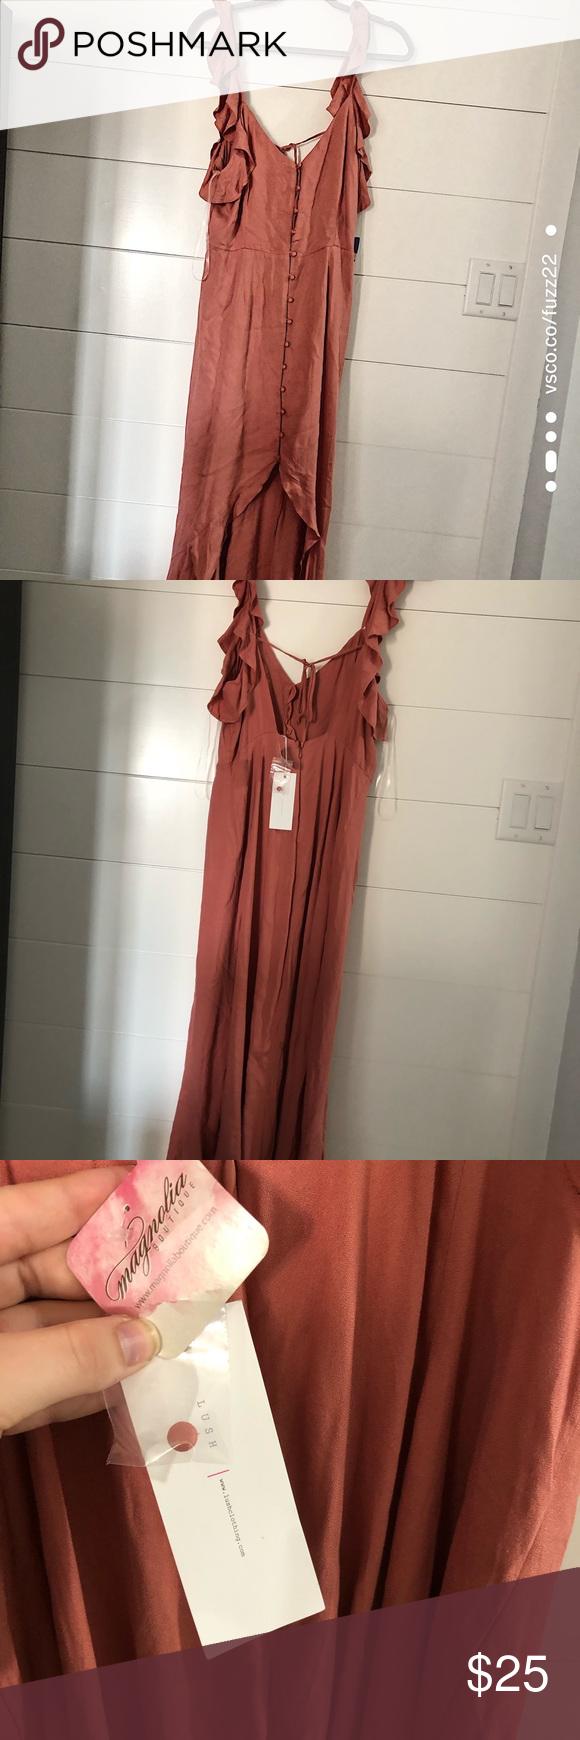 17+ Latest Lush Brand Dresses